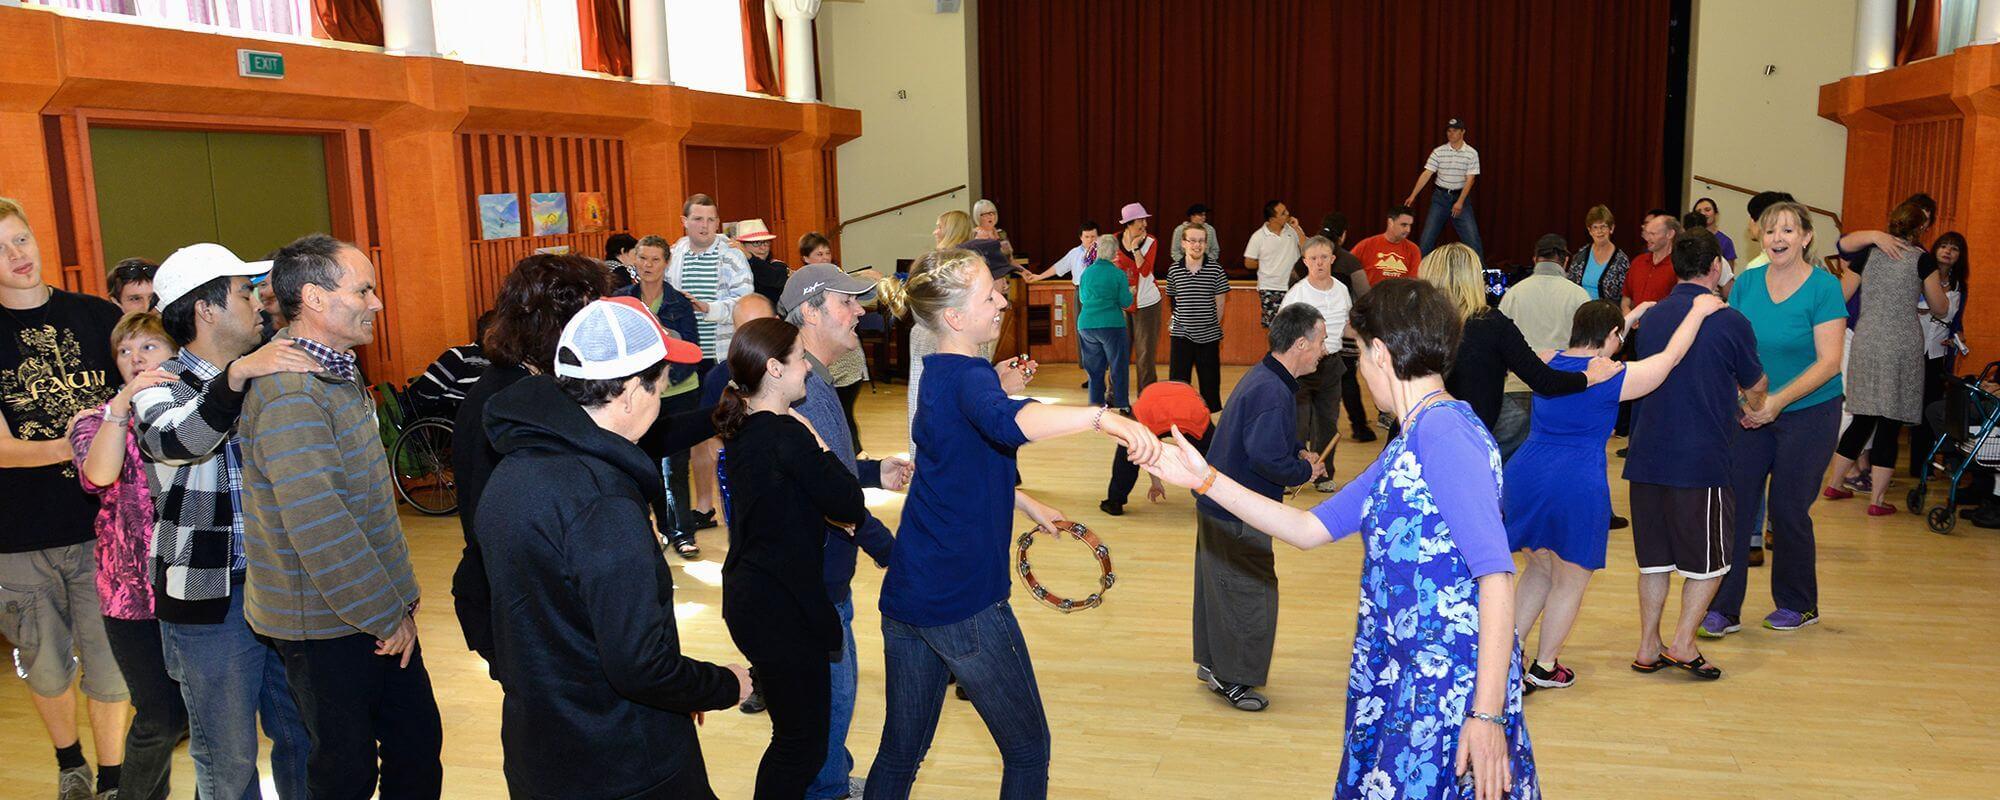 Hohepa Canterbury Dance Hall